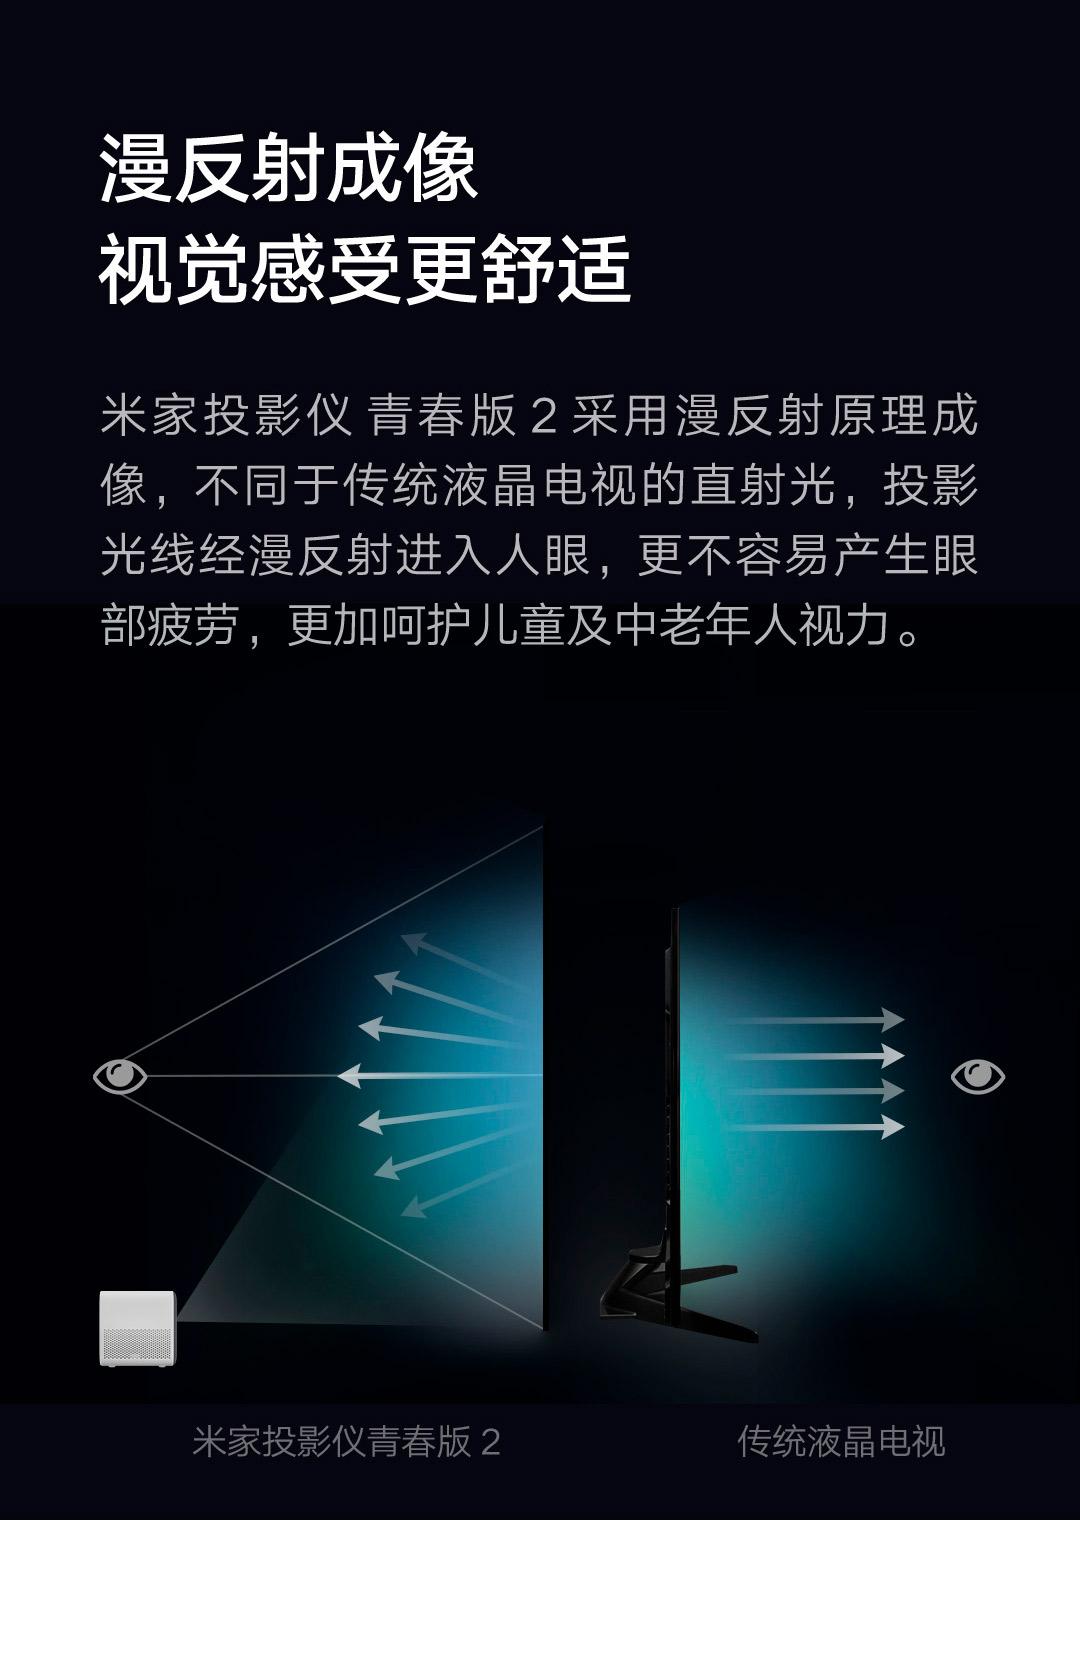 product_奇妙_米家投影仪